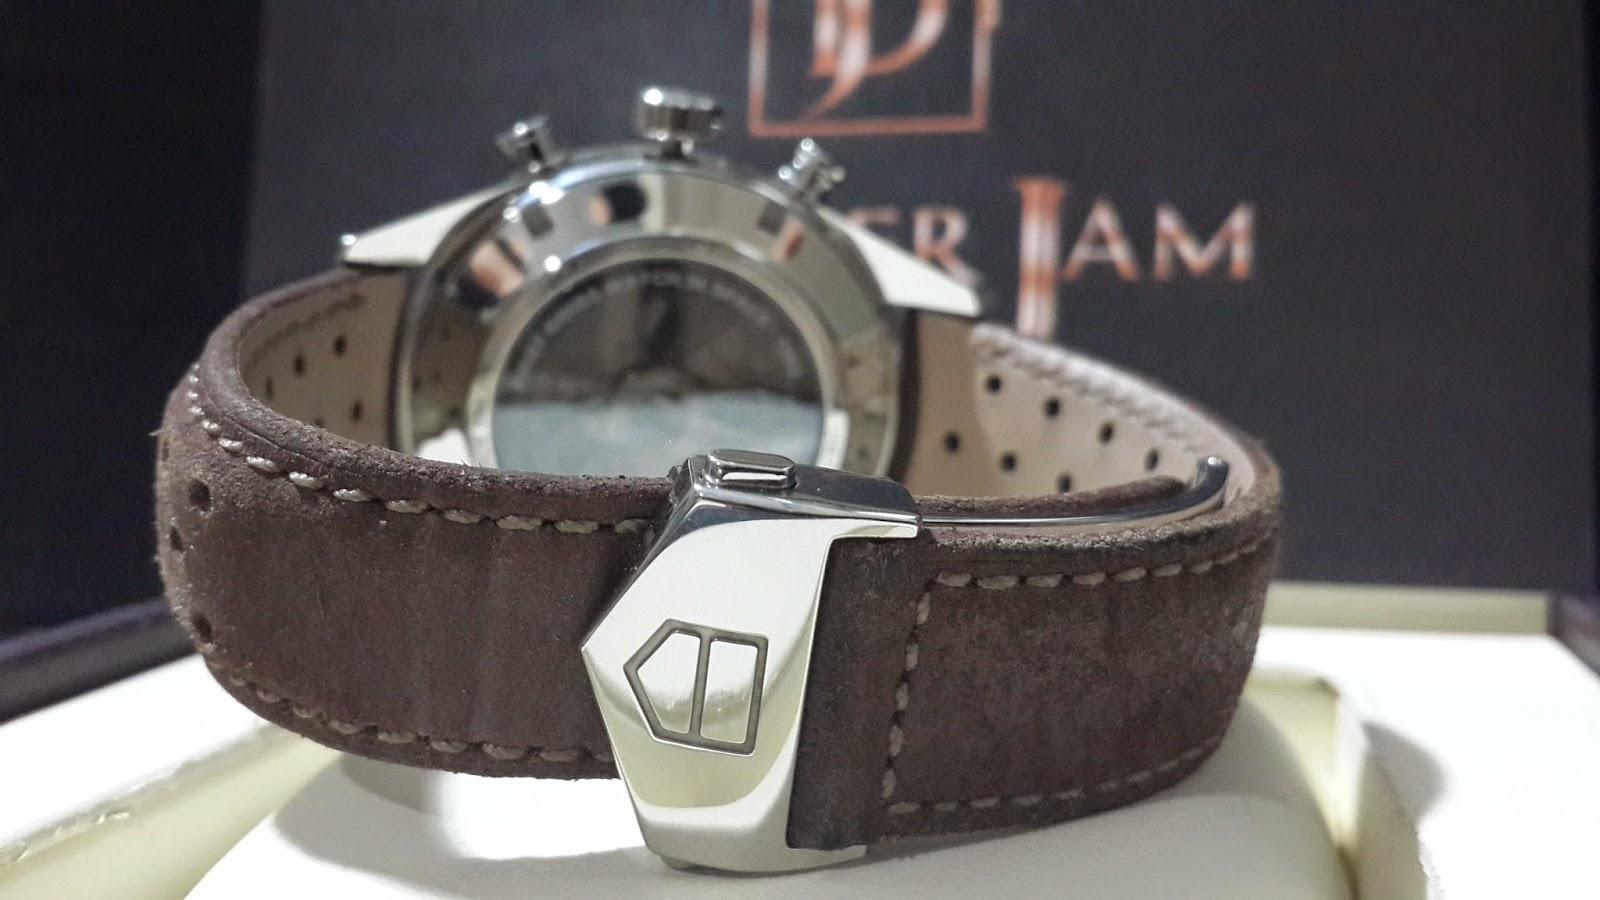 Jam tangan tag heuer space x original